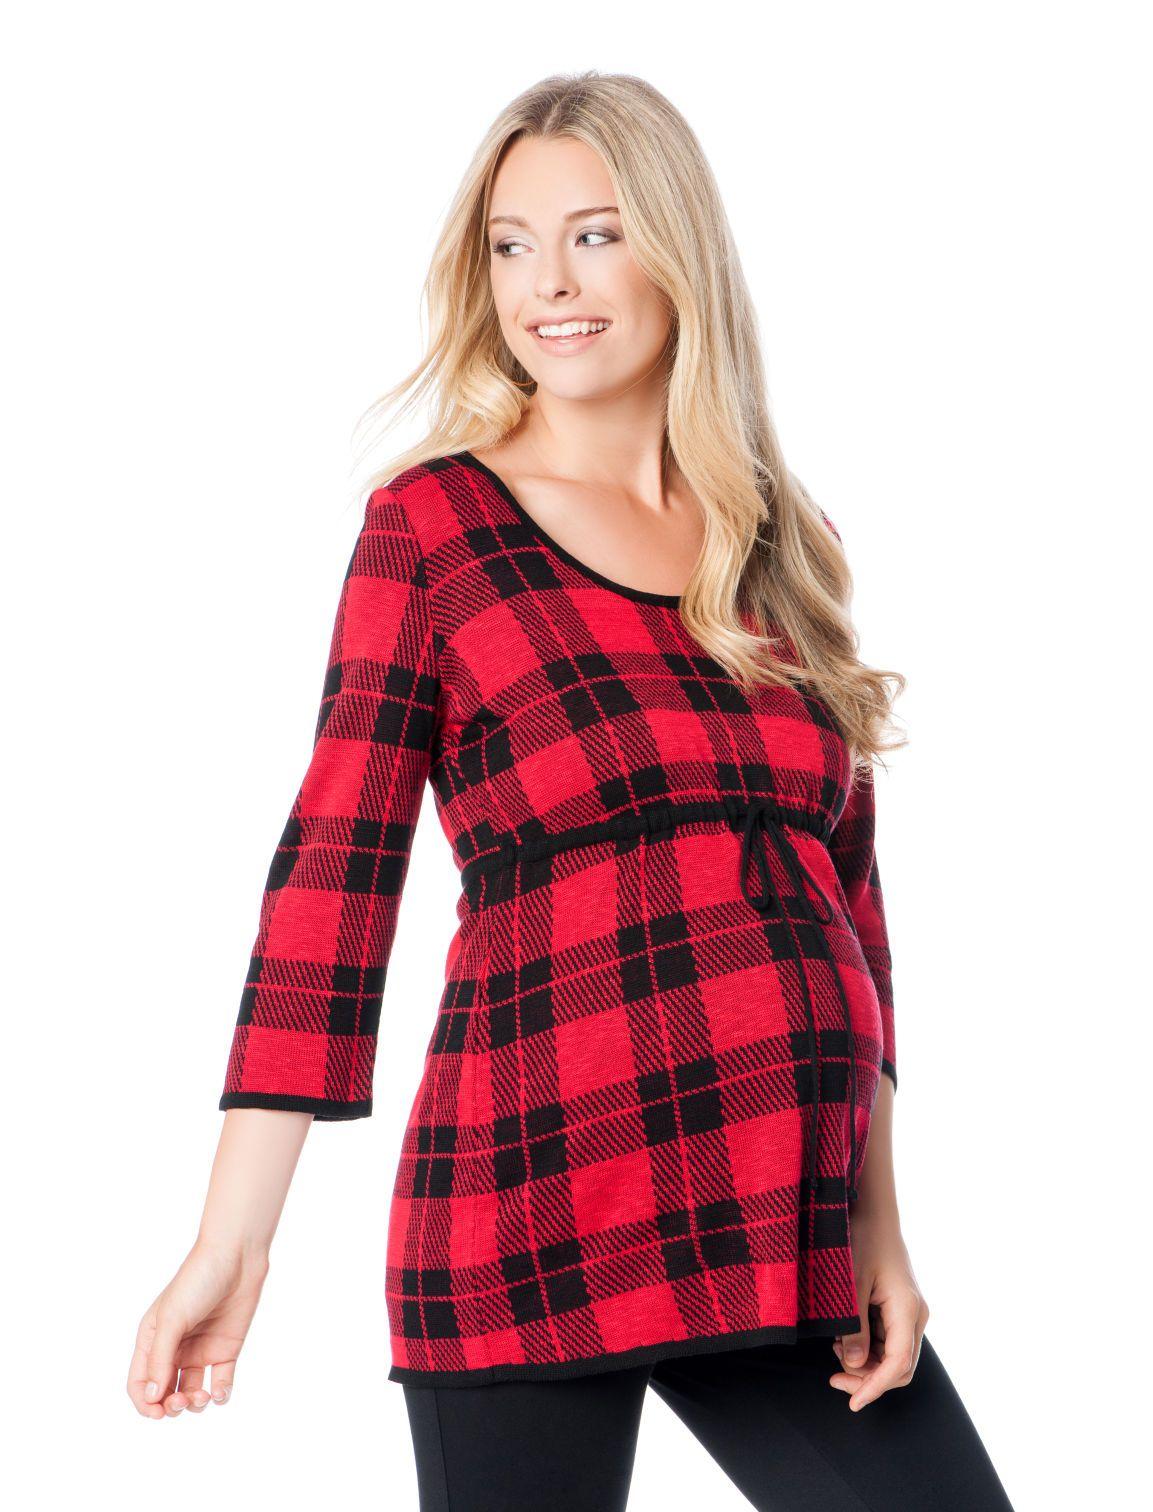 dcf2f4b5f48ea festive red + black plaid babydoll maternity sweater by Motherhood Maternity  | Pregnancy Wishlist